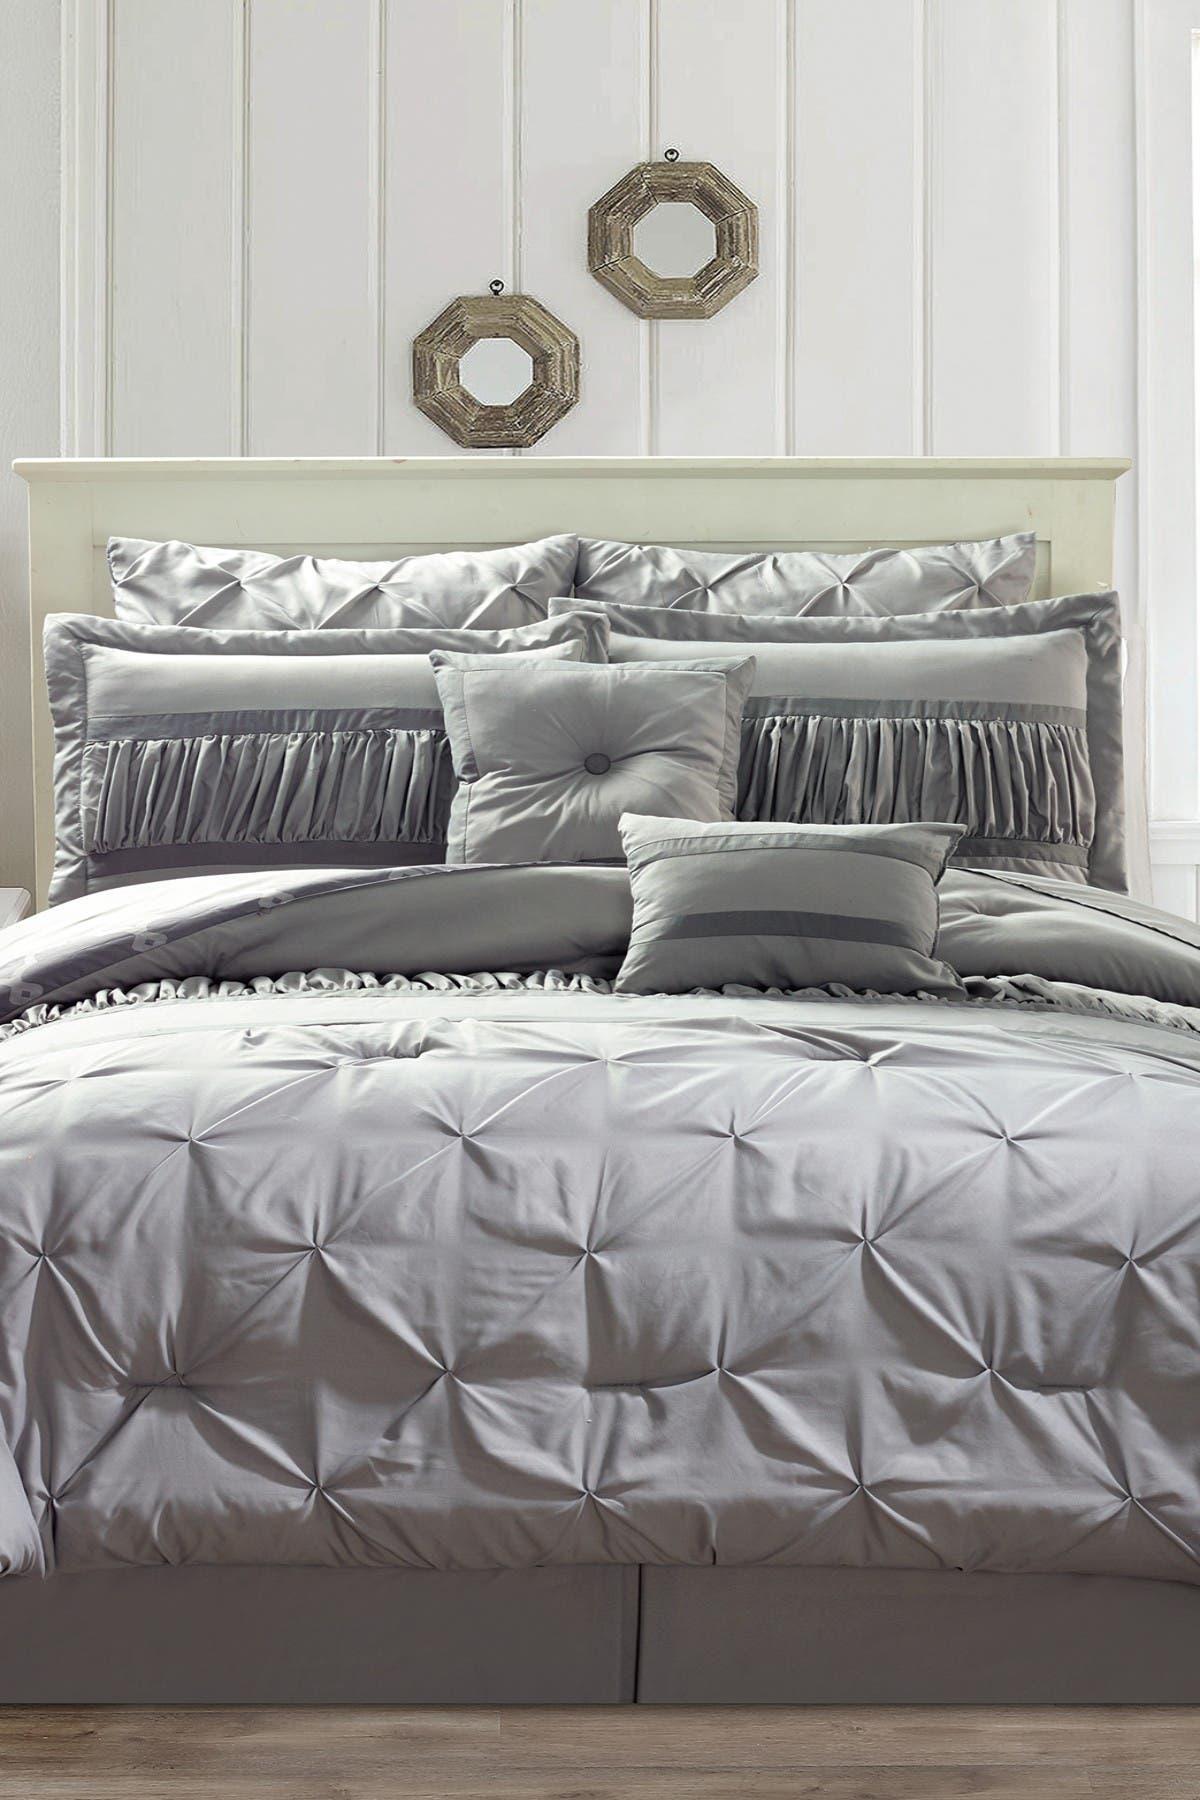 Image of Duck River Textile Marlin 10-Piece Queen Comforter Set - Silver